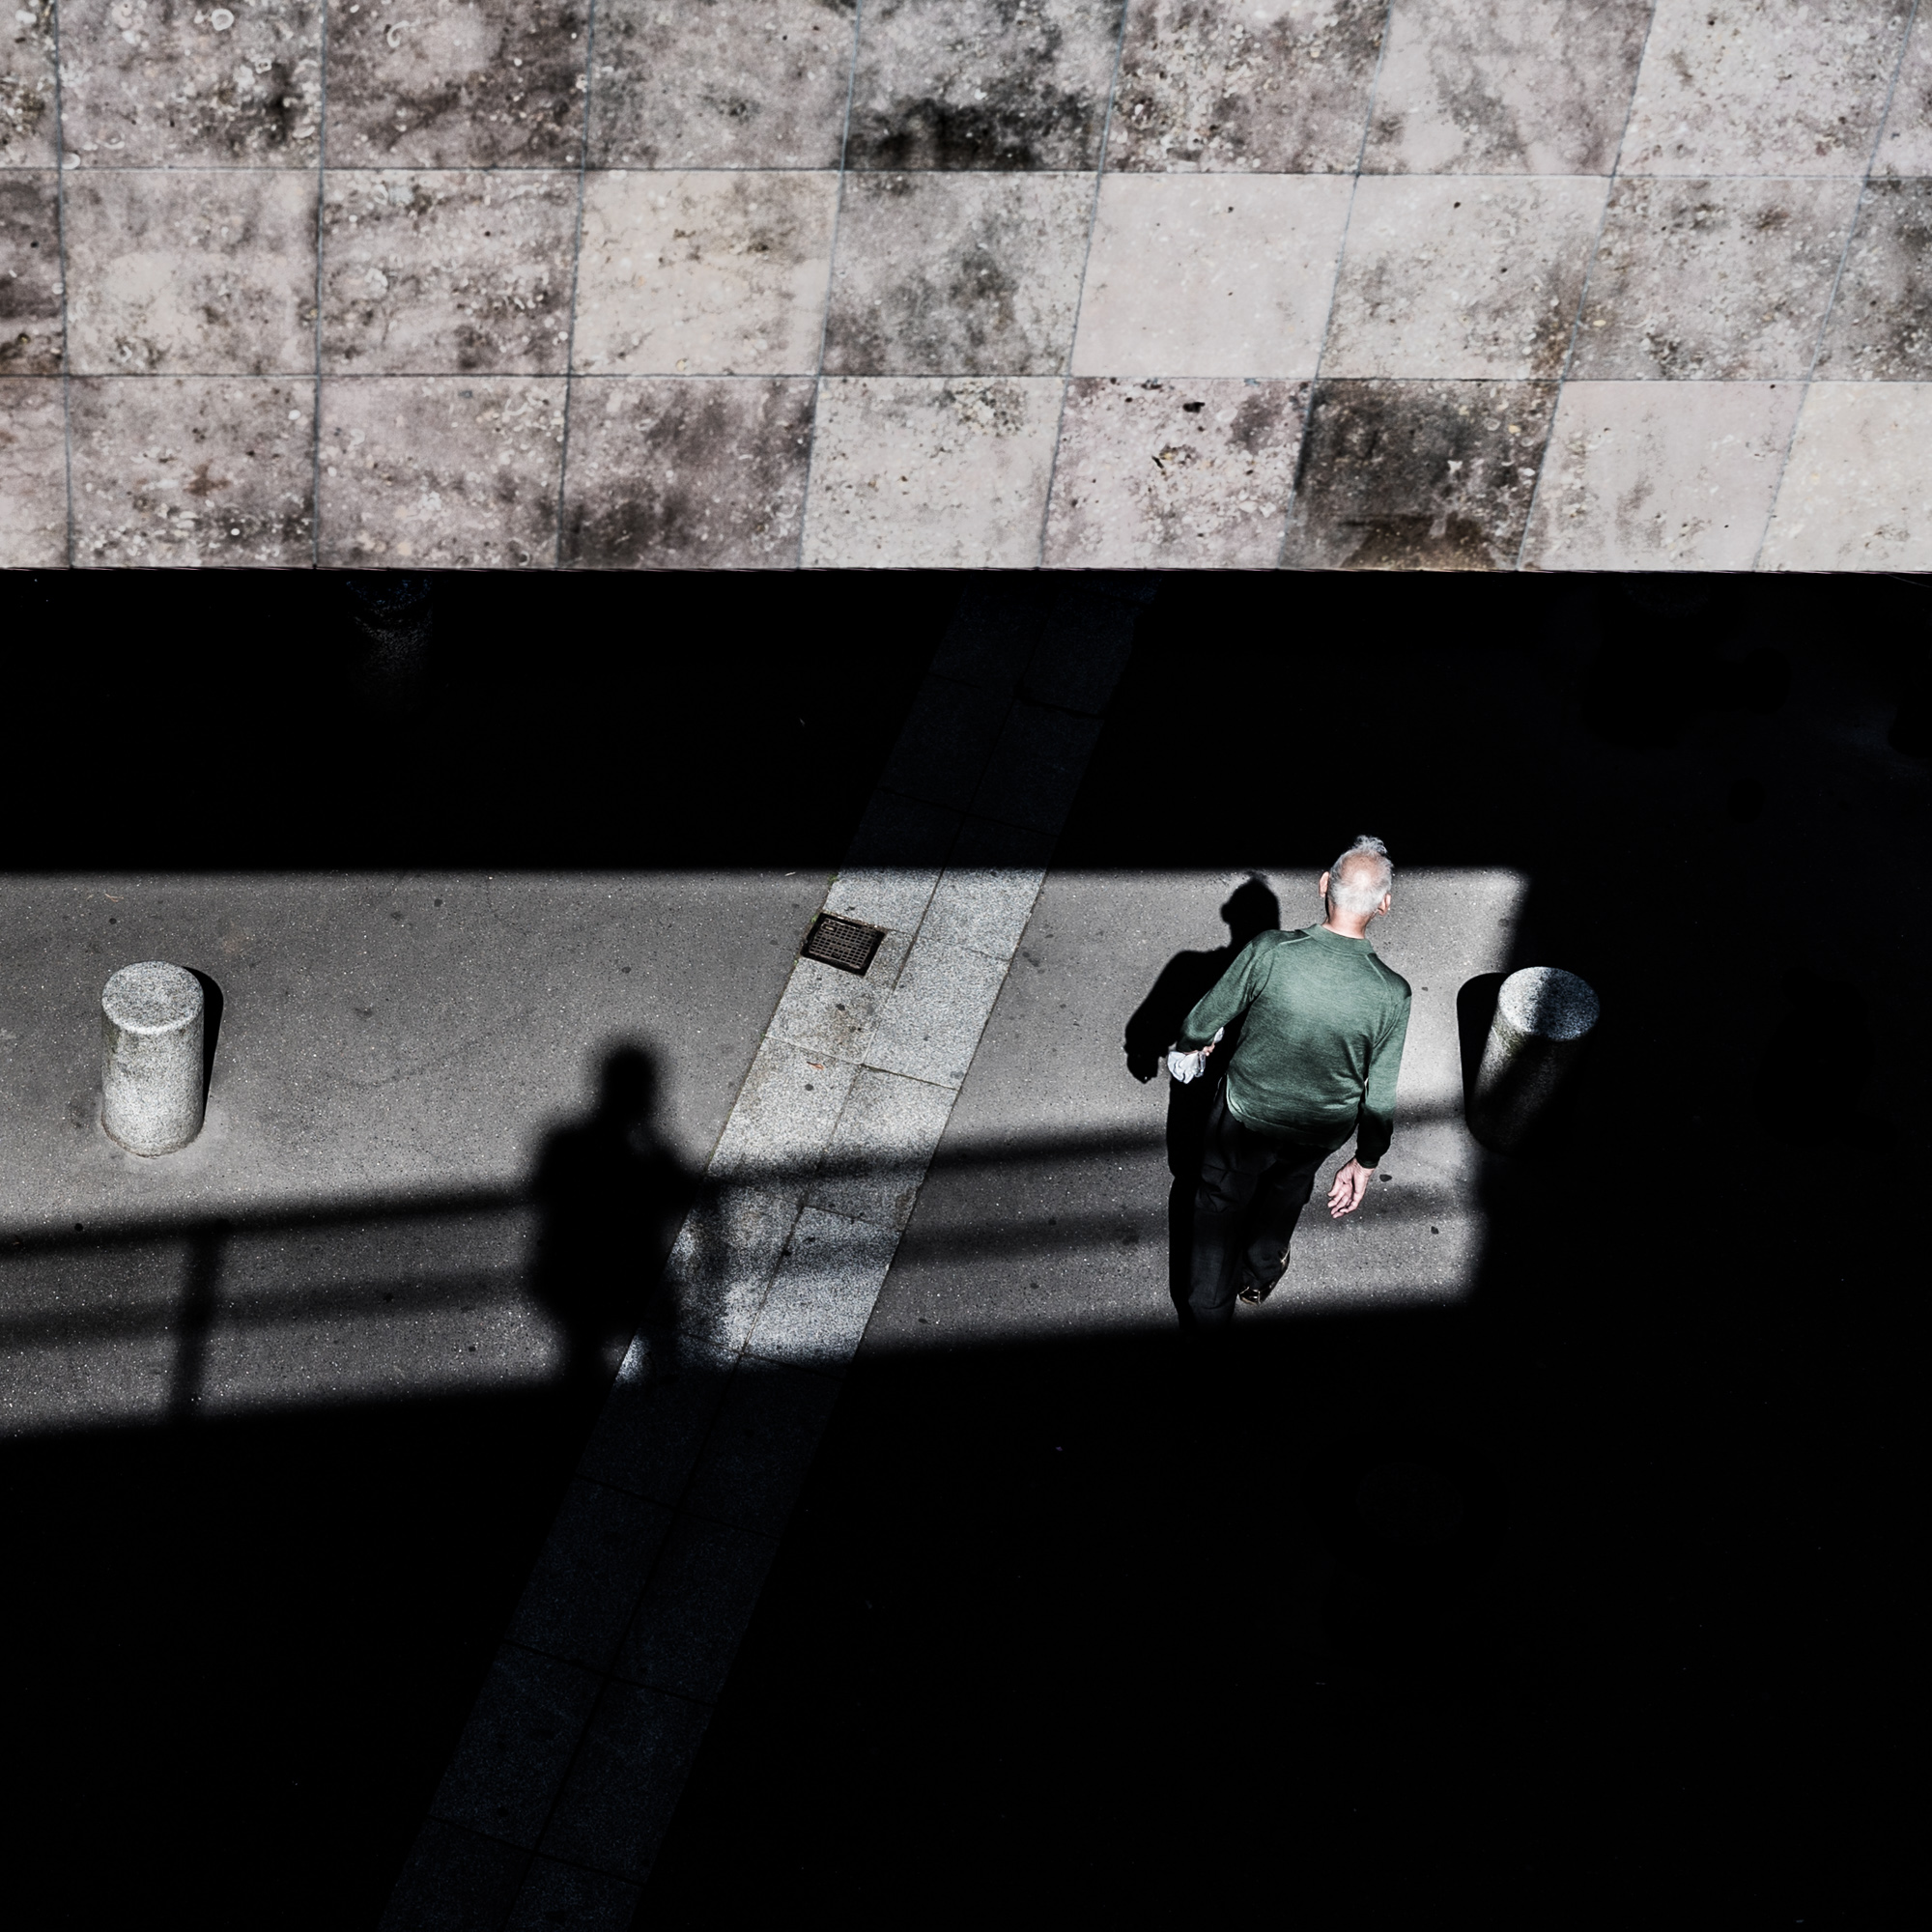 shadow, men, bridge, pont, passing